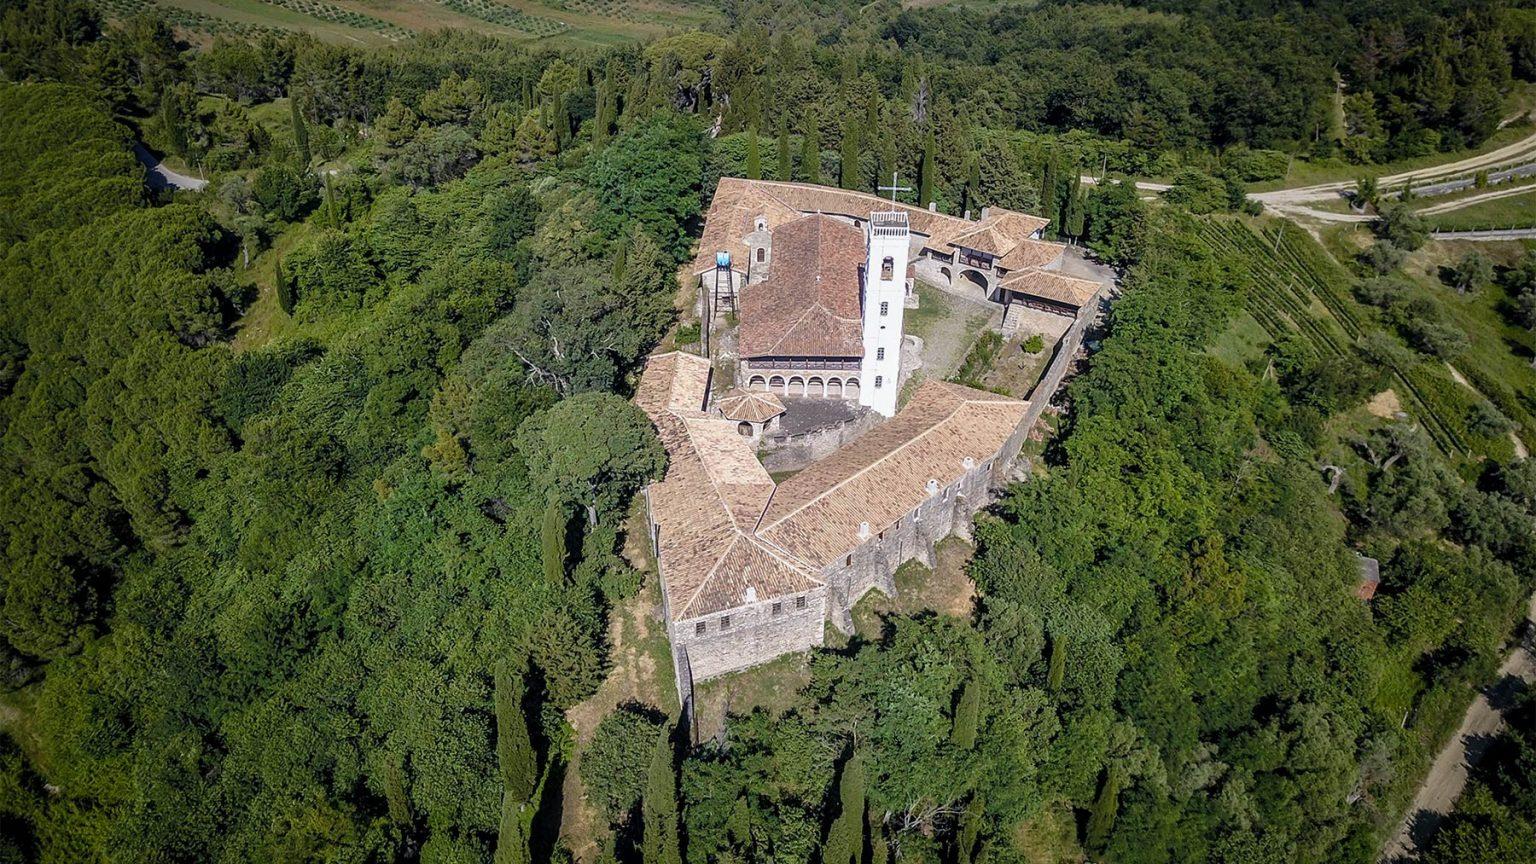 Ardenica Monastery from above, Fier. Photo courtesy of: Enea Musrafaraj